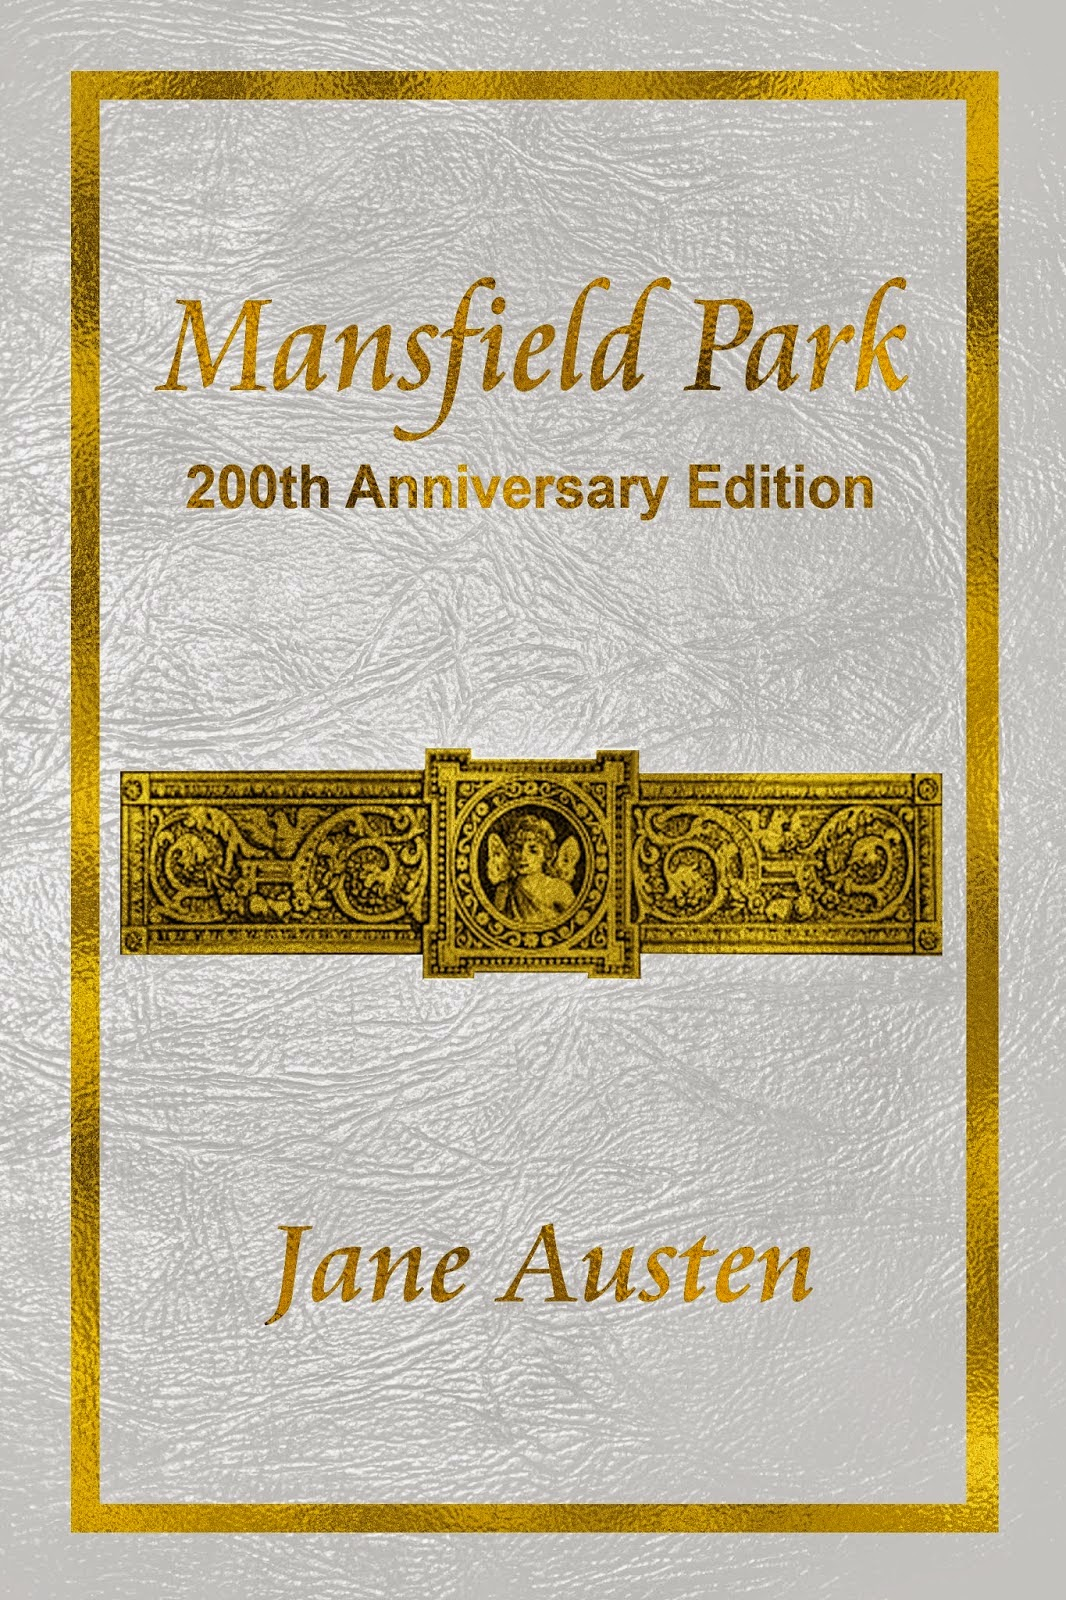 jane austen sense and sensibility full text pdf